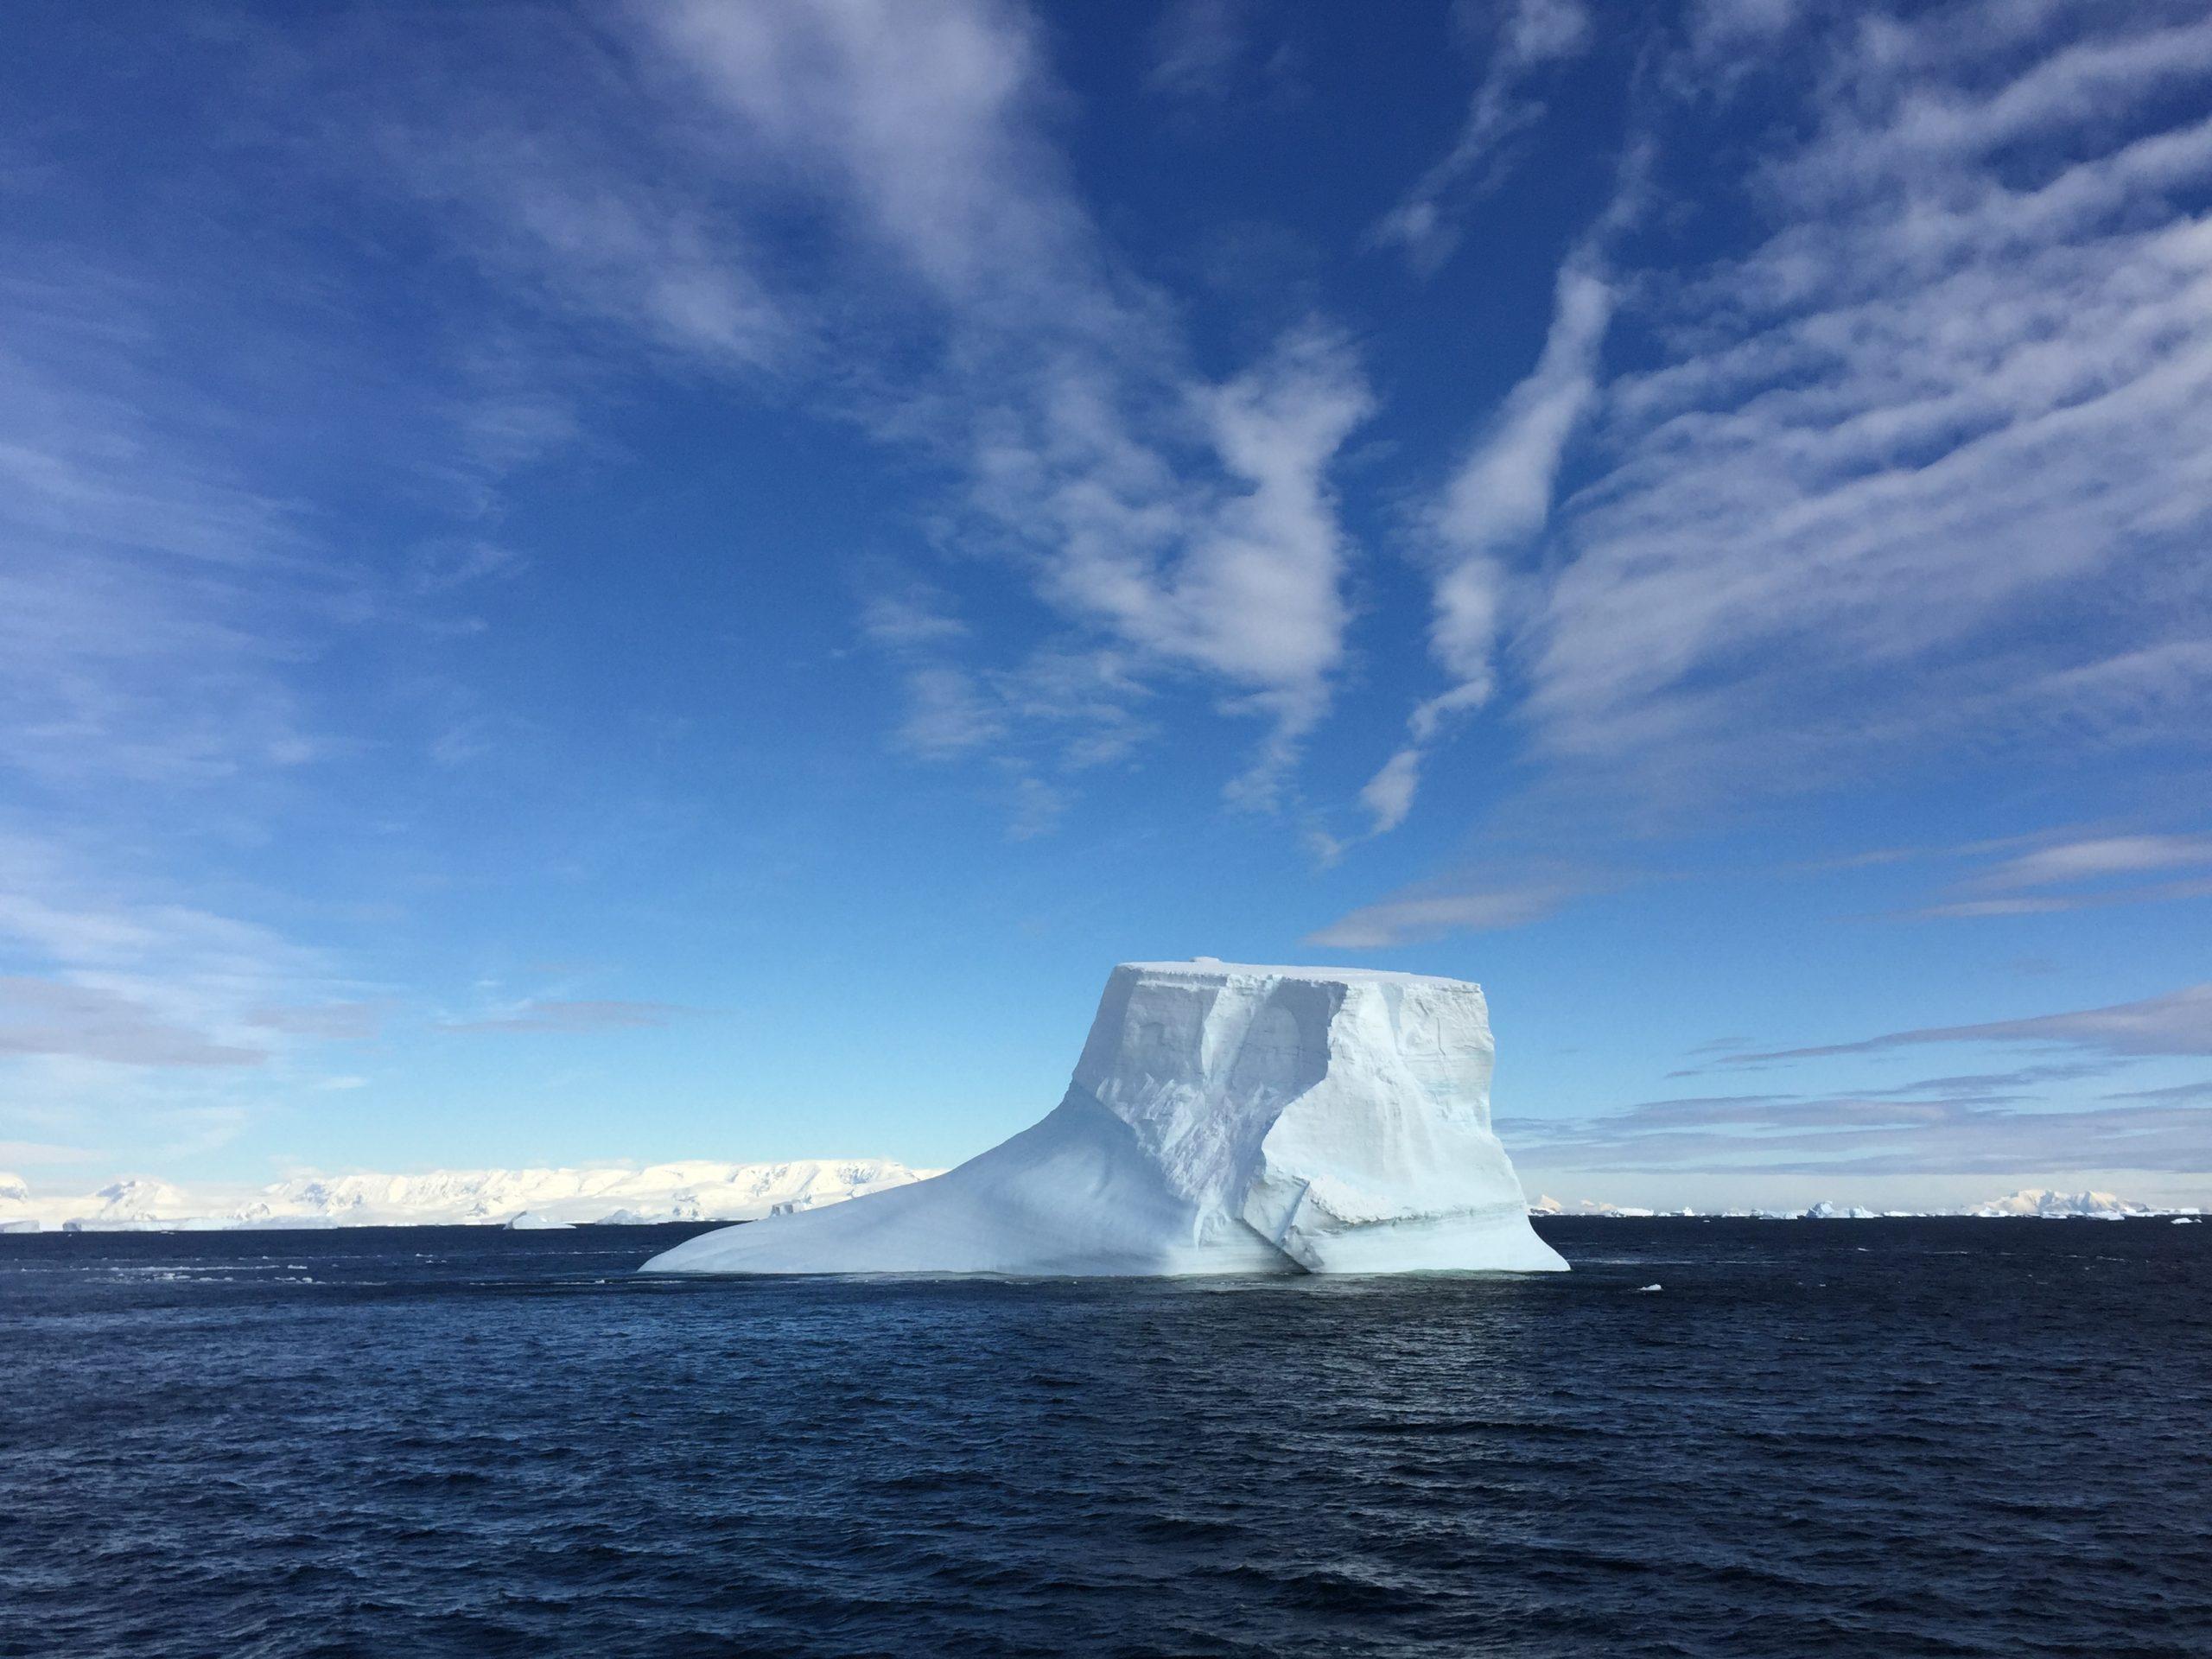 A vast iceberg floats under an expansive blue sky